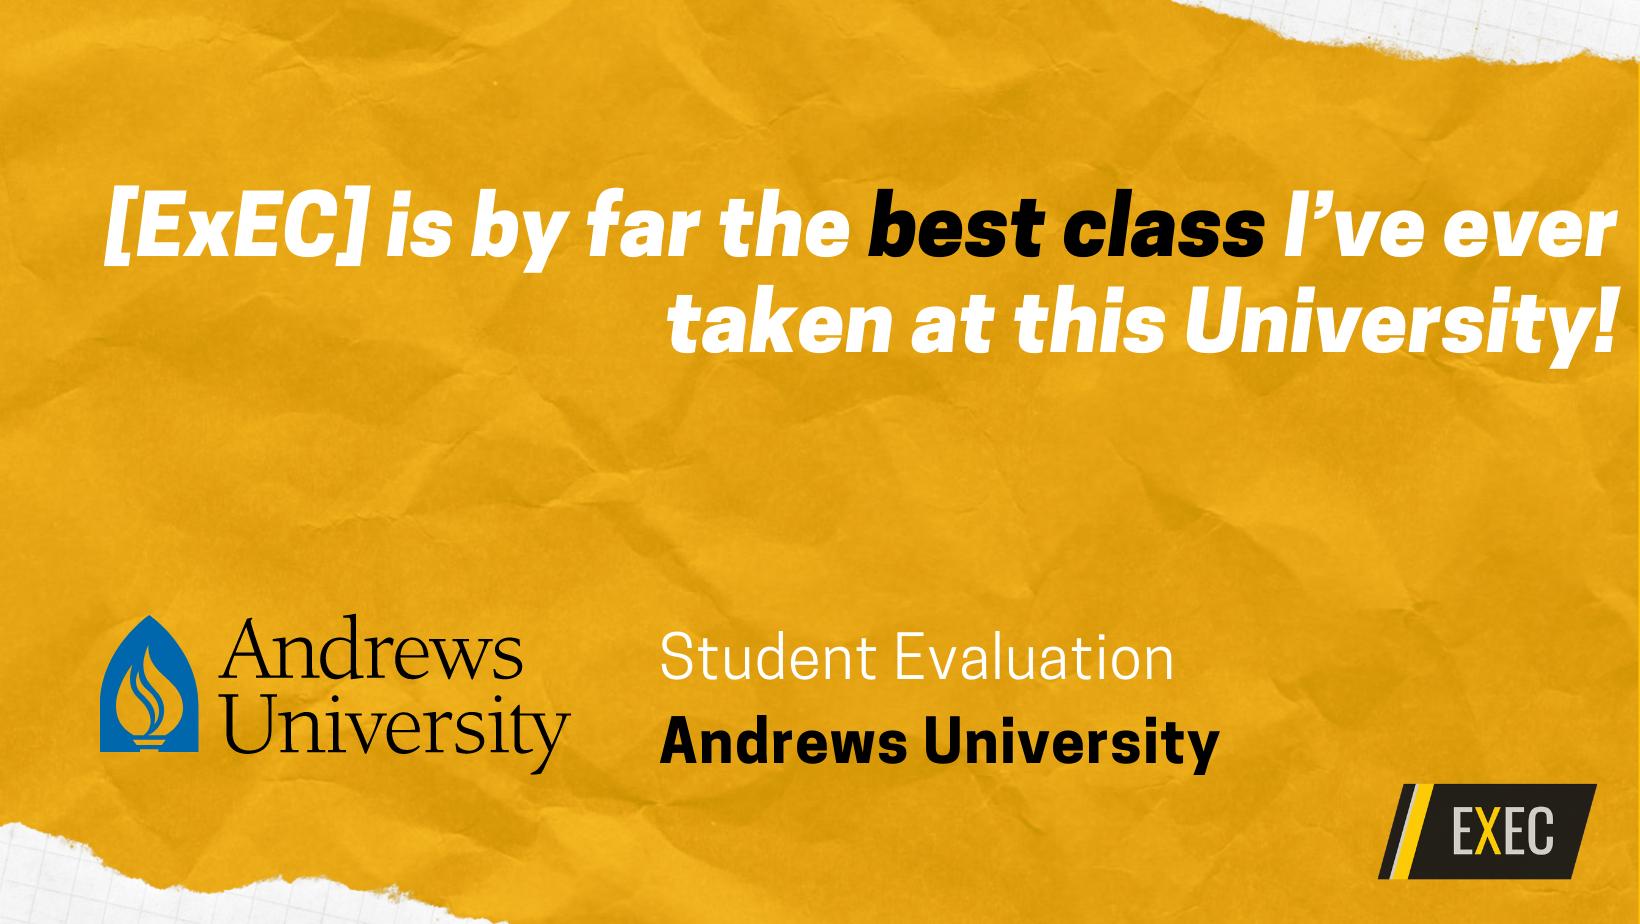 Improve student evaluations